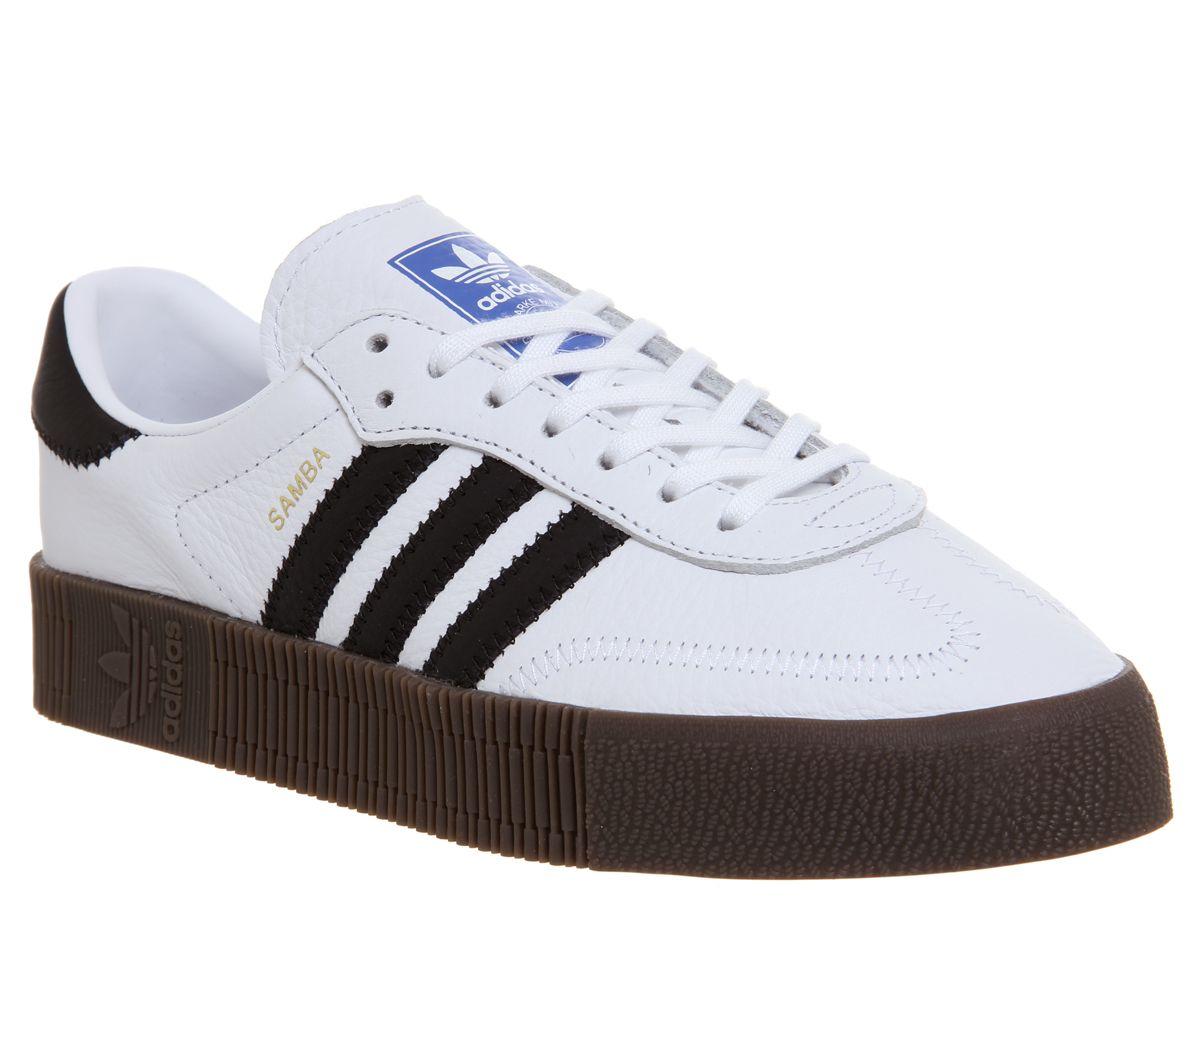 88bfbb56fe7 adidas Samba Rose Trainers White Core Black Gum - Hers trainers